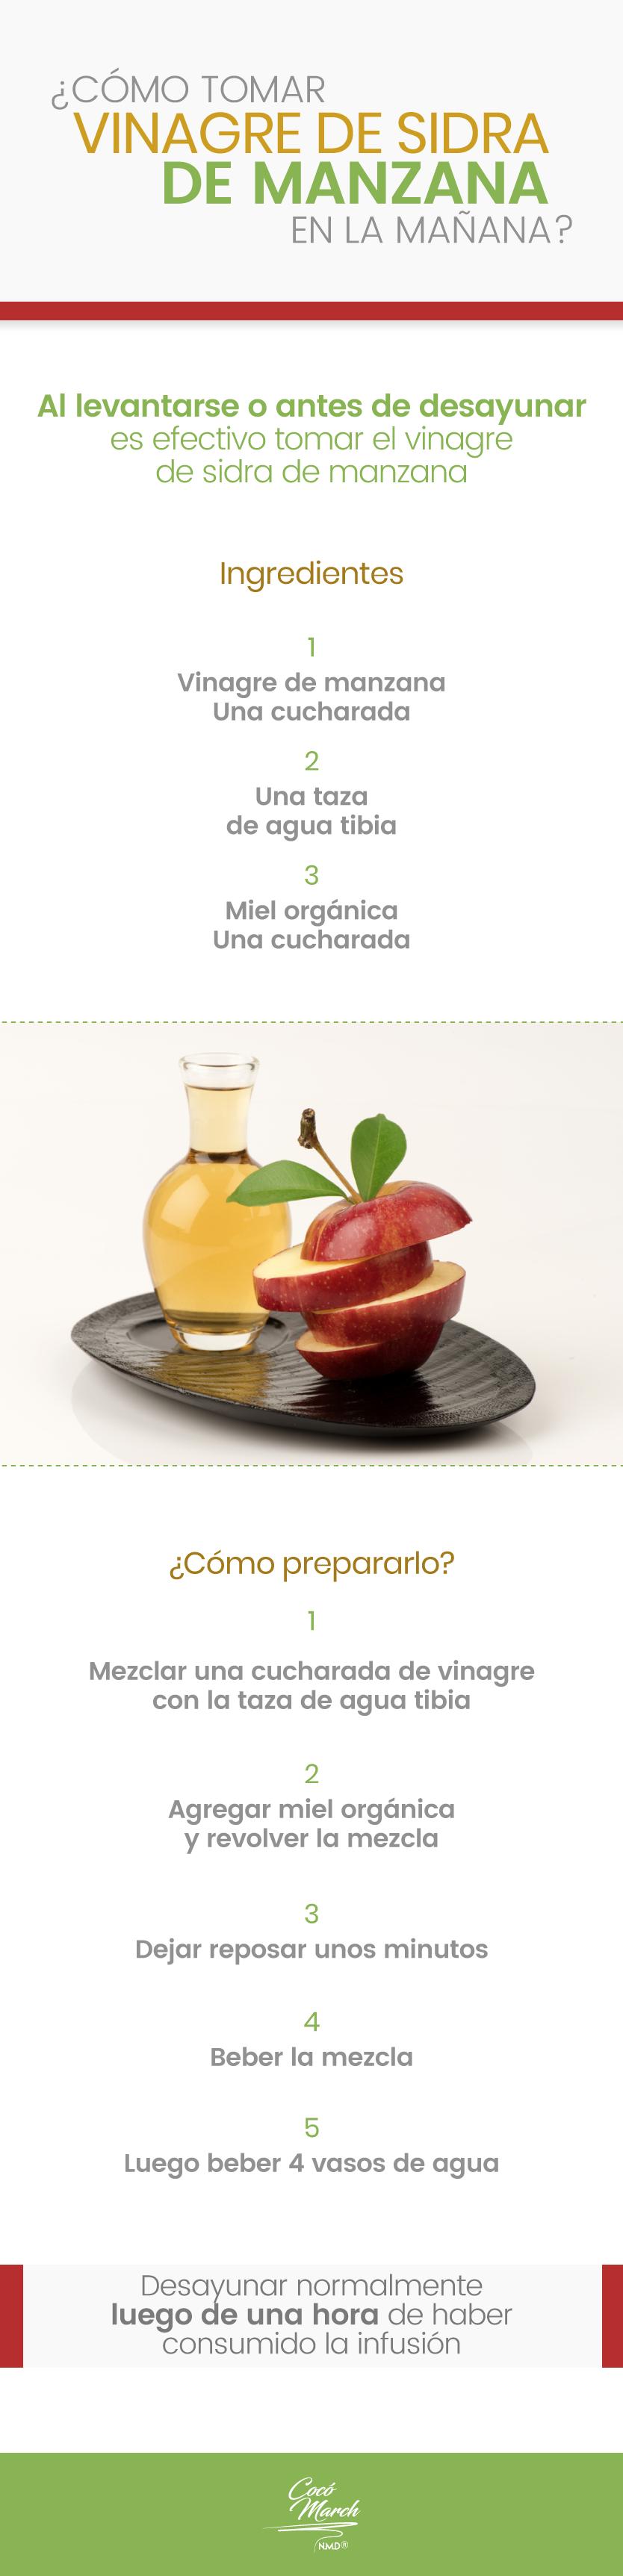 como-tomar-vinagre-de-sidra-de-manzana